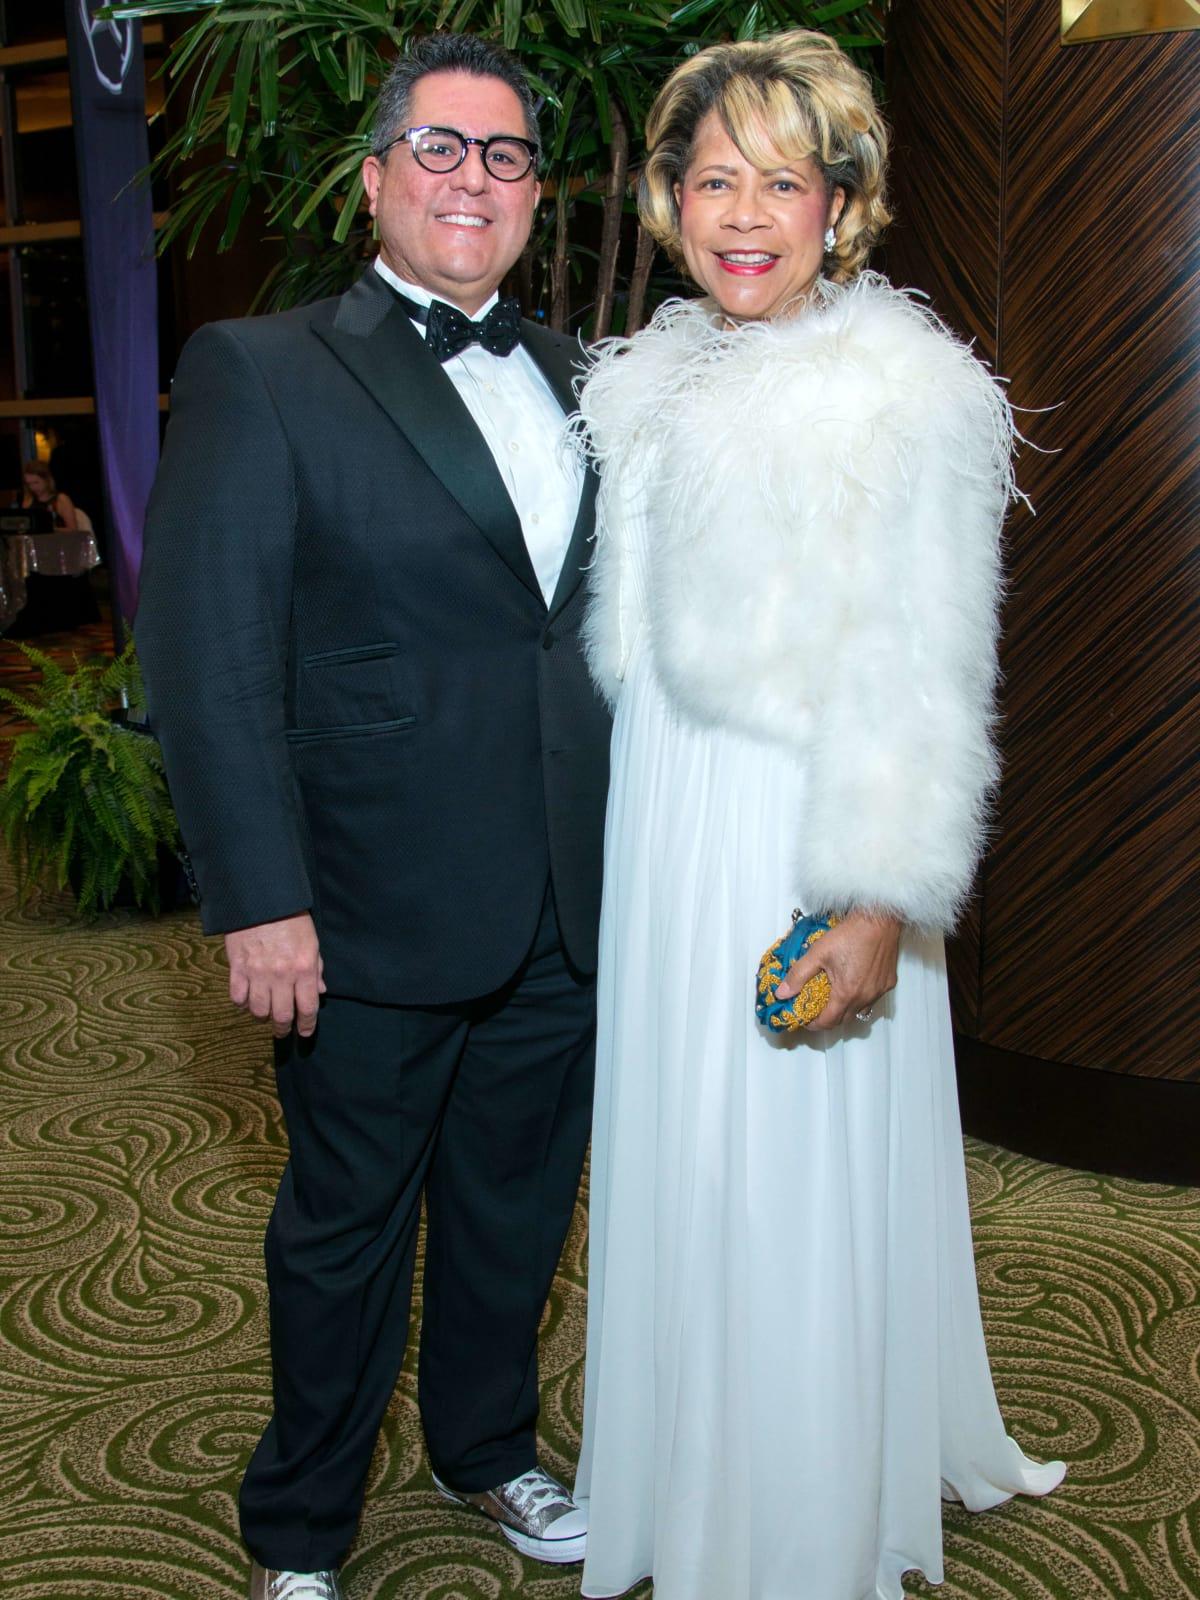 Houston, Women of Distinction fashionable gowns, Feb 2017, Dr Roland Maldonado, Merele Yarborough